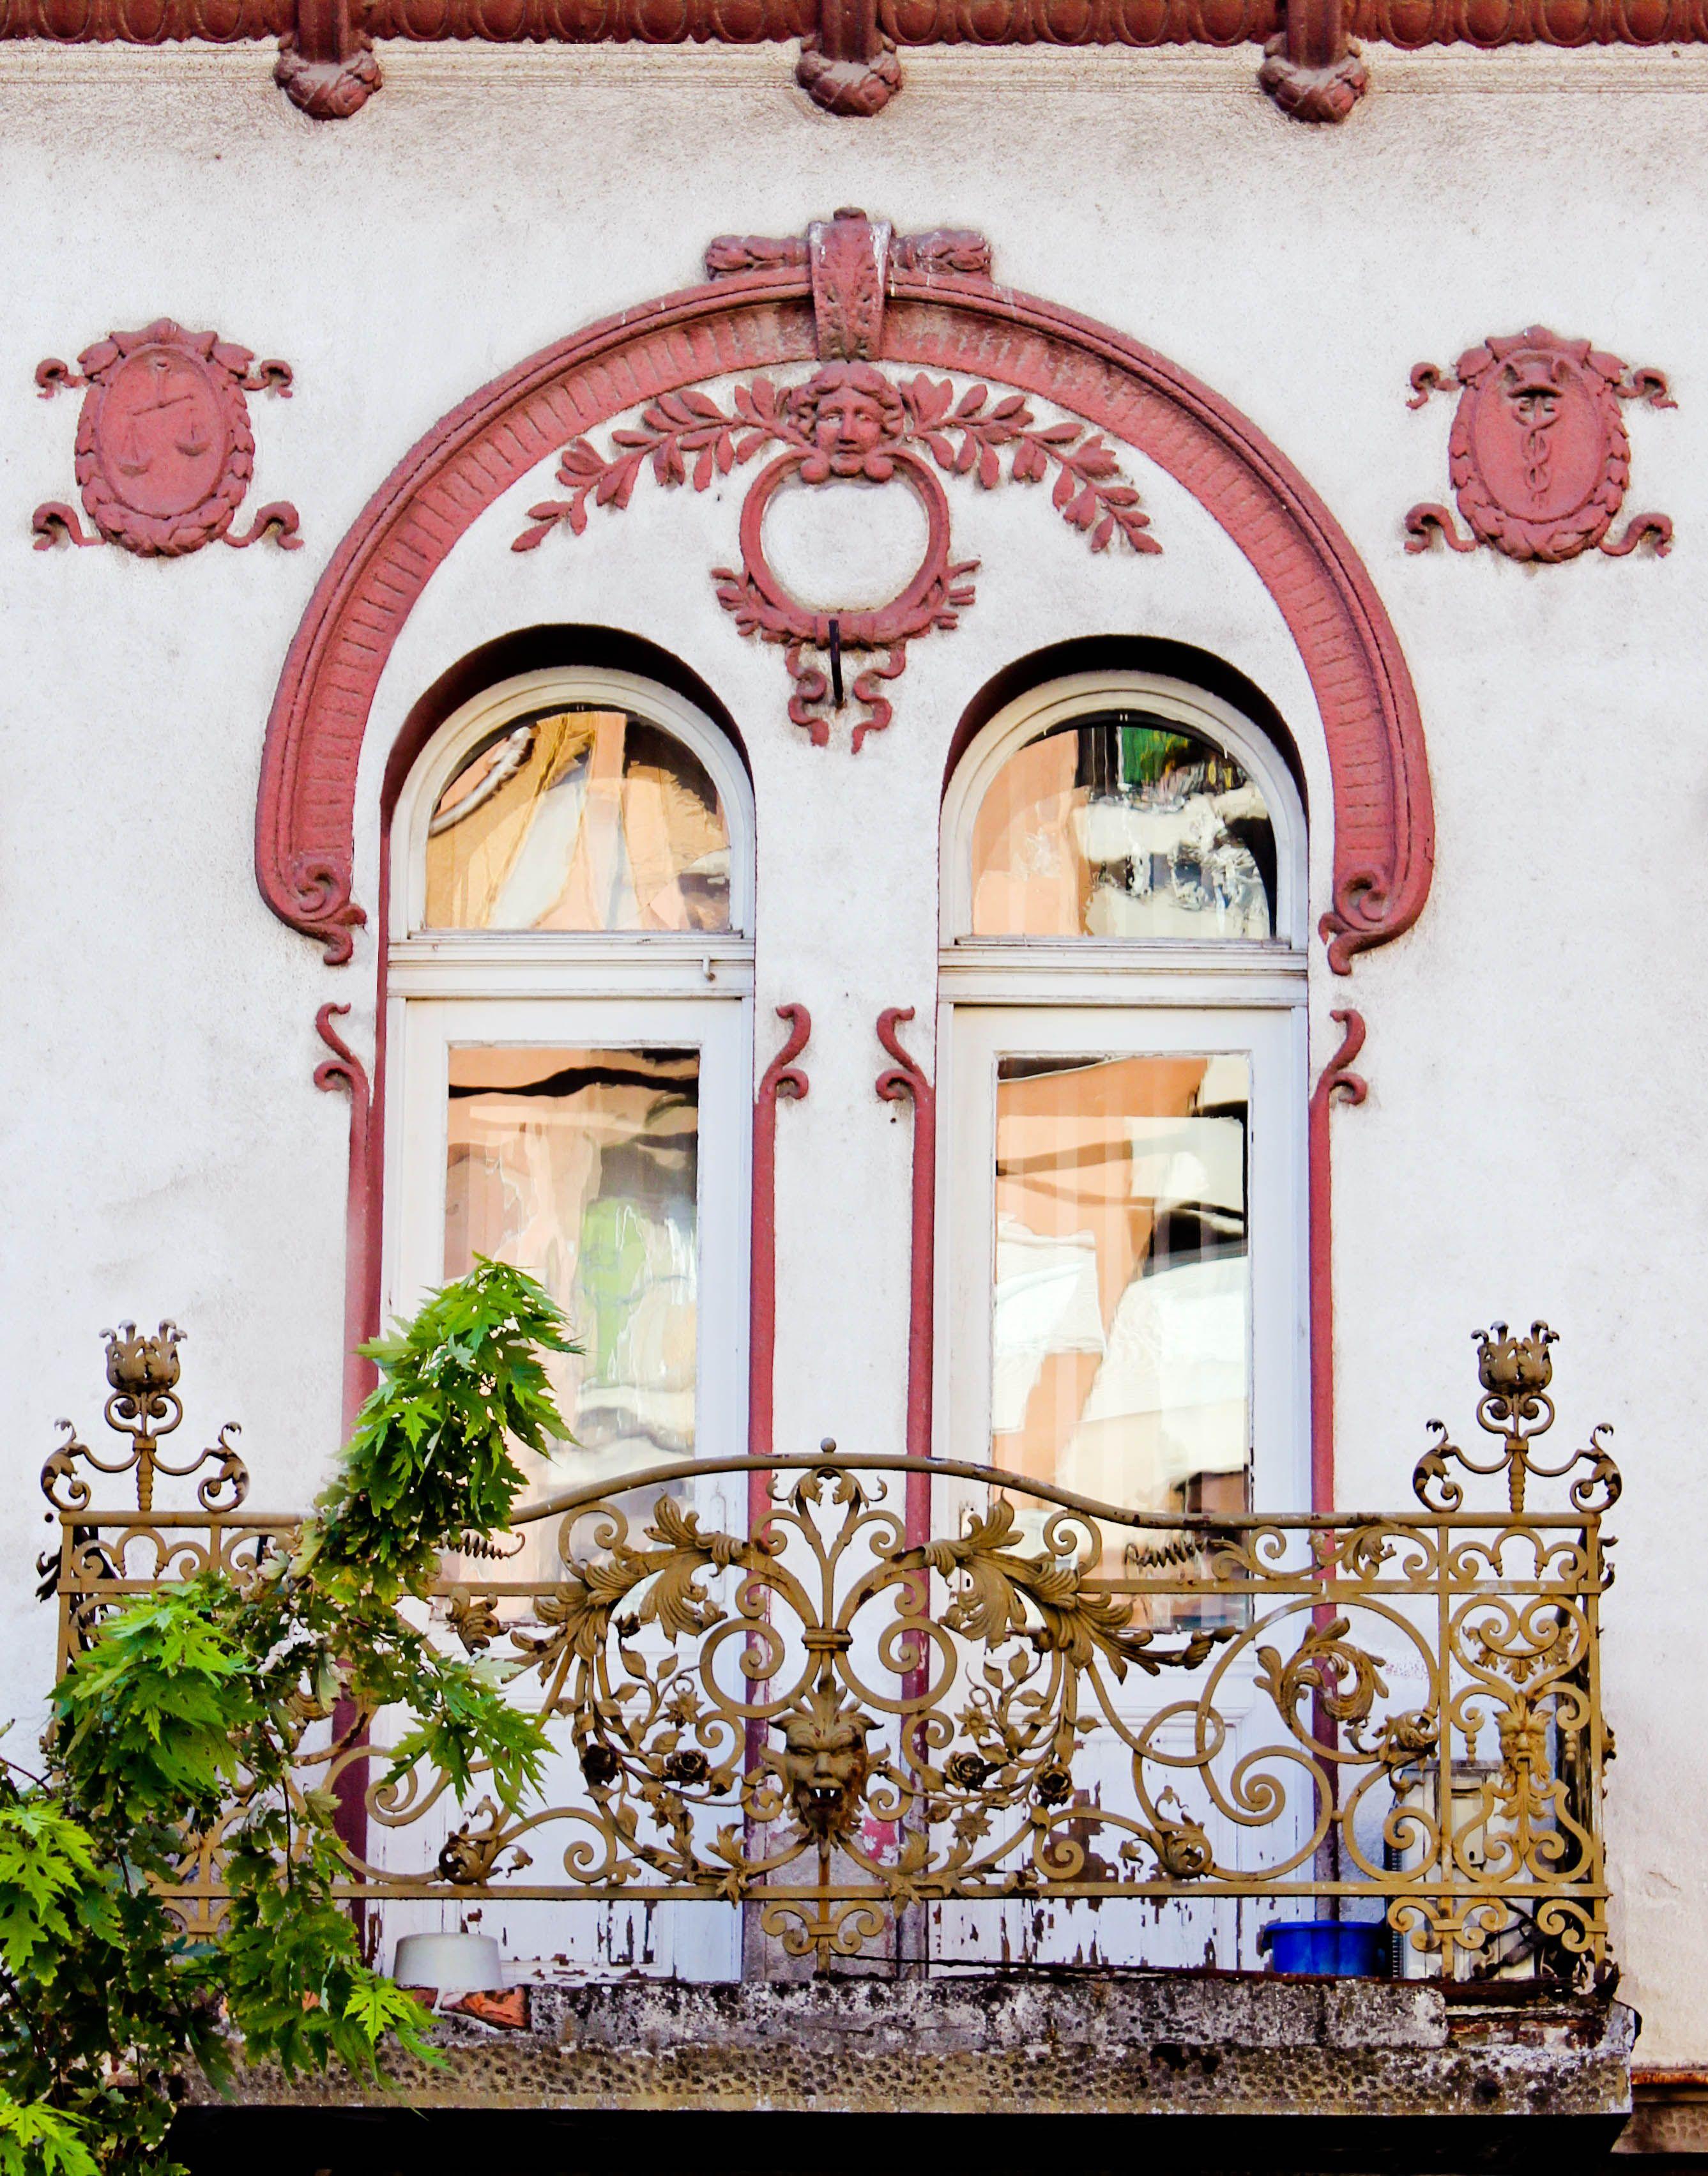 #citylibrary #window #old